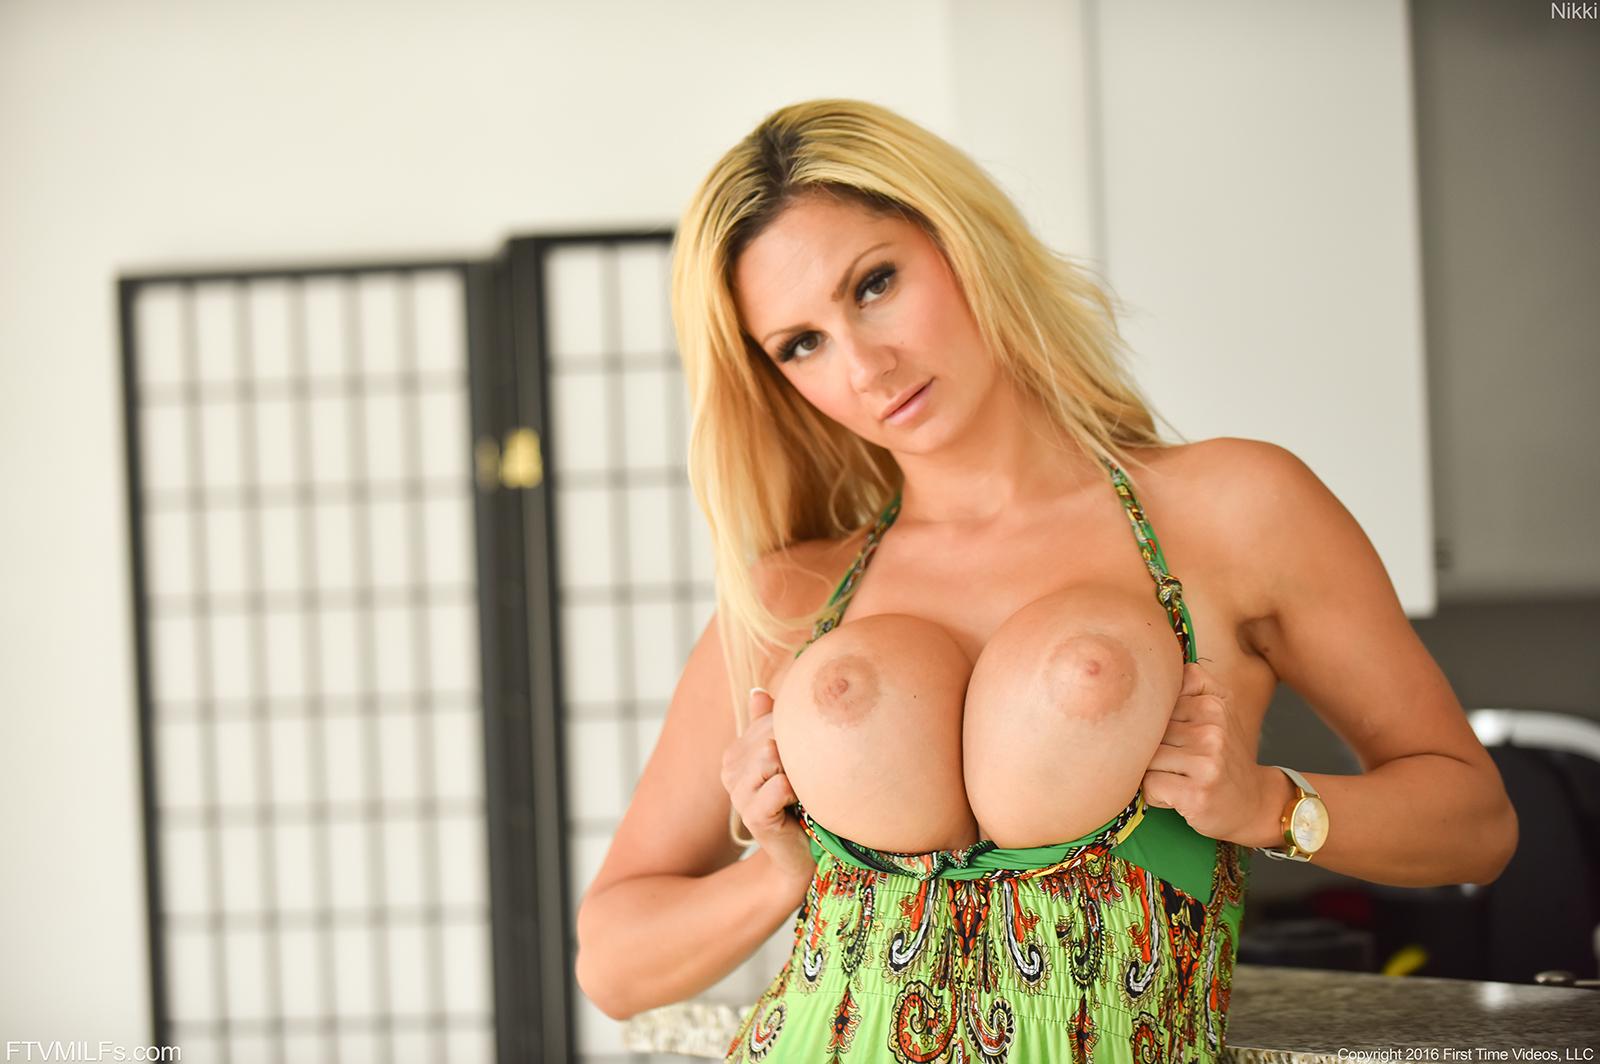 Nikki diamond tits nude